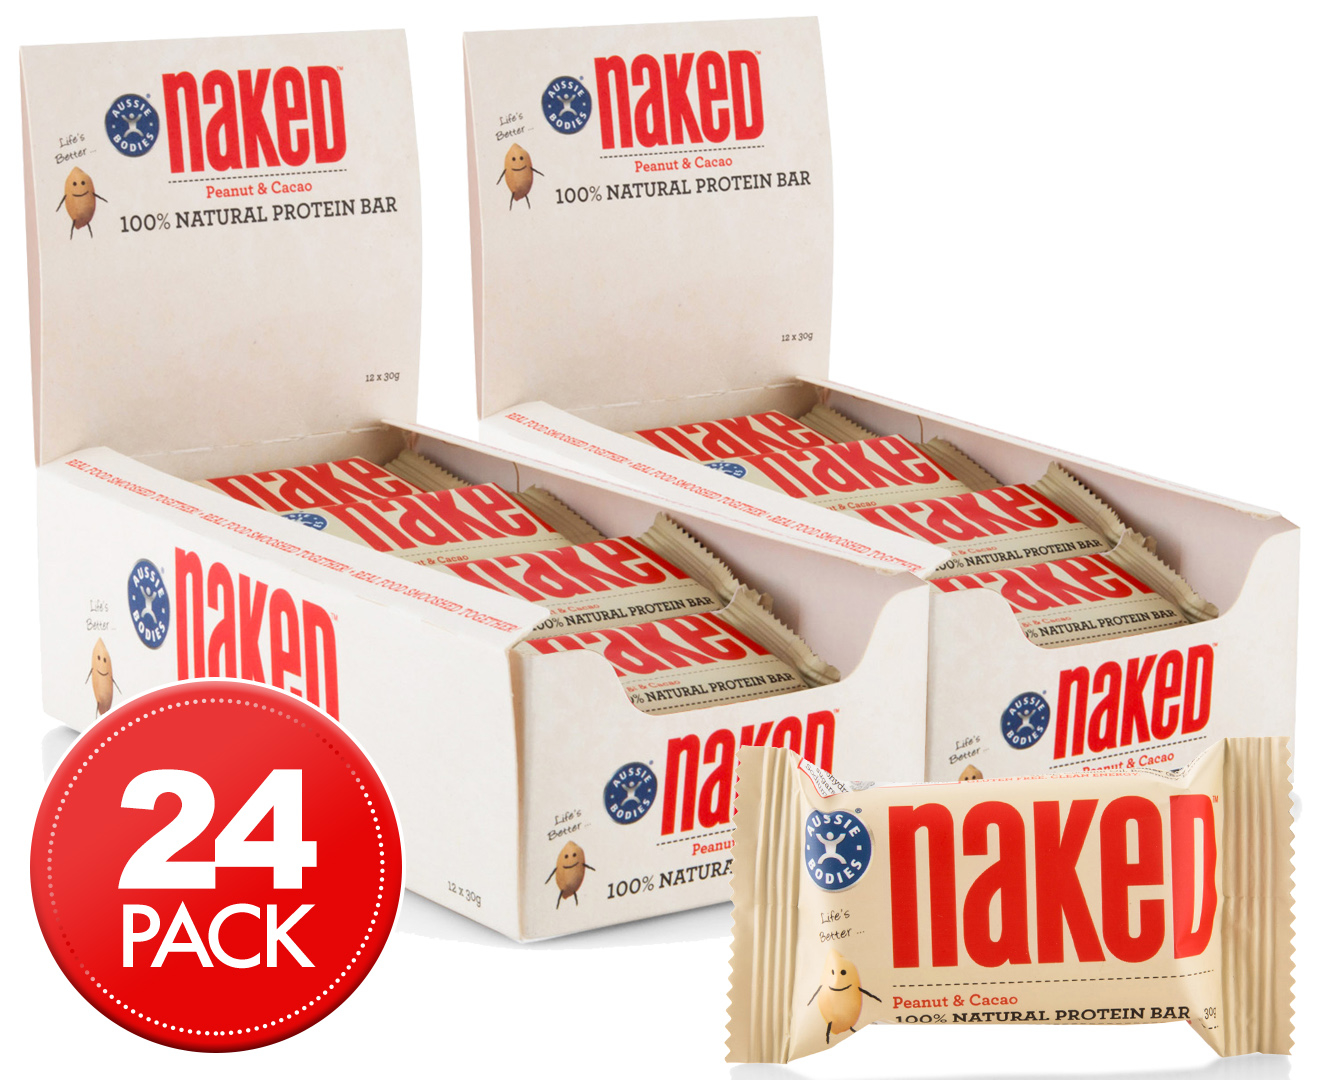 2 x Aussie Bodies Naked Natural Protein Bars Peanut